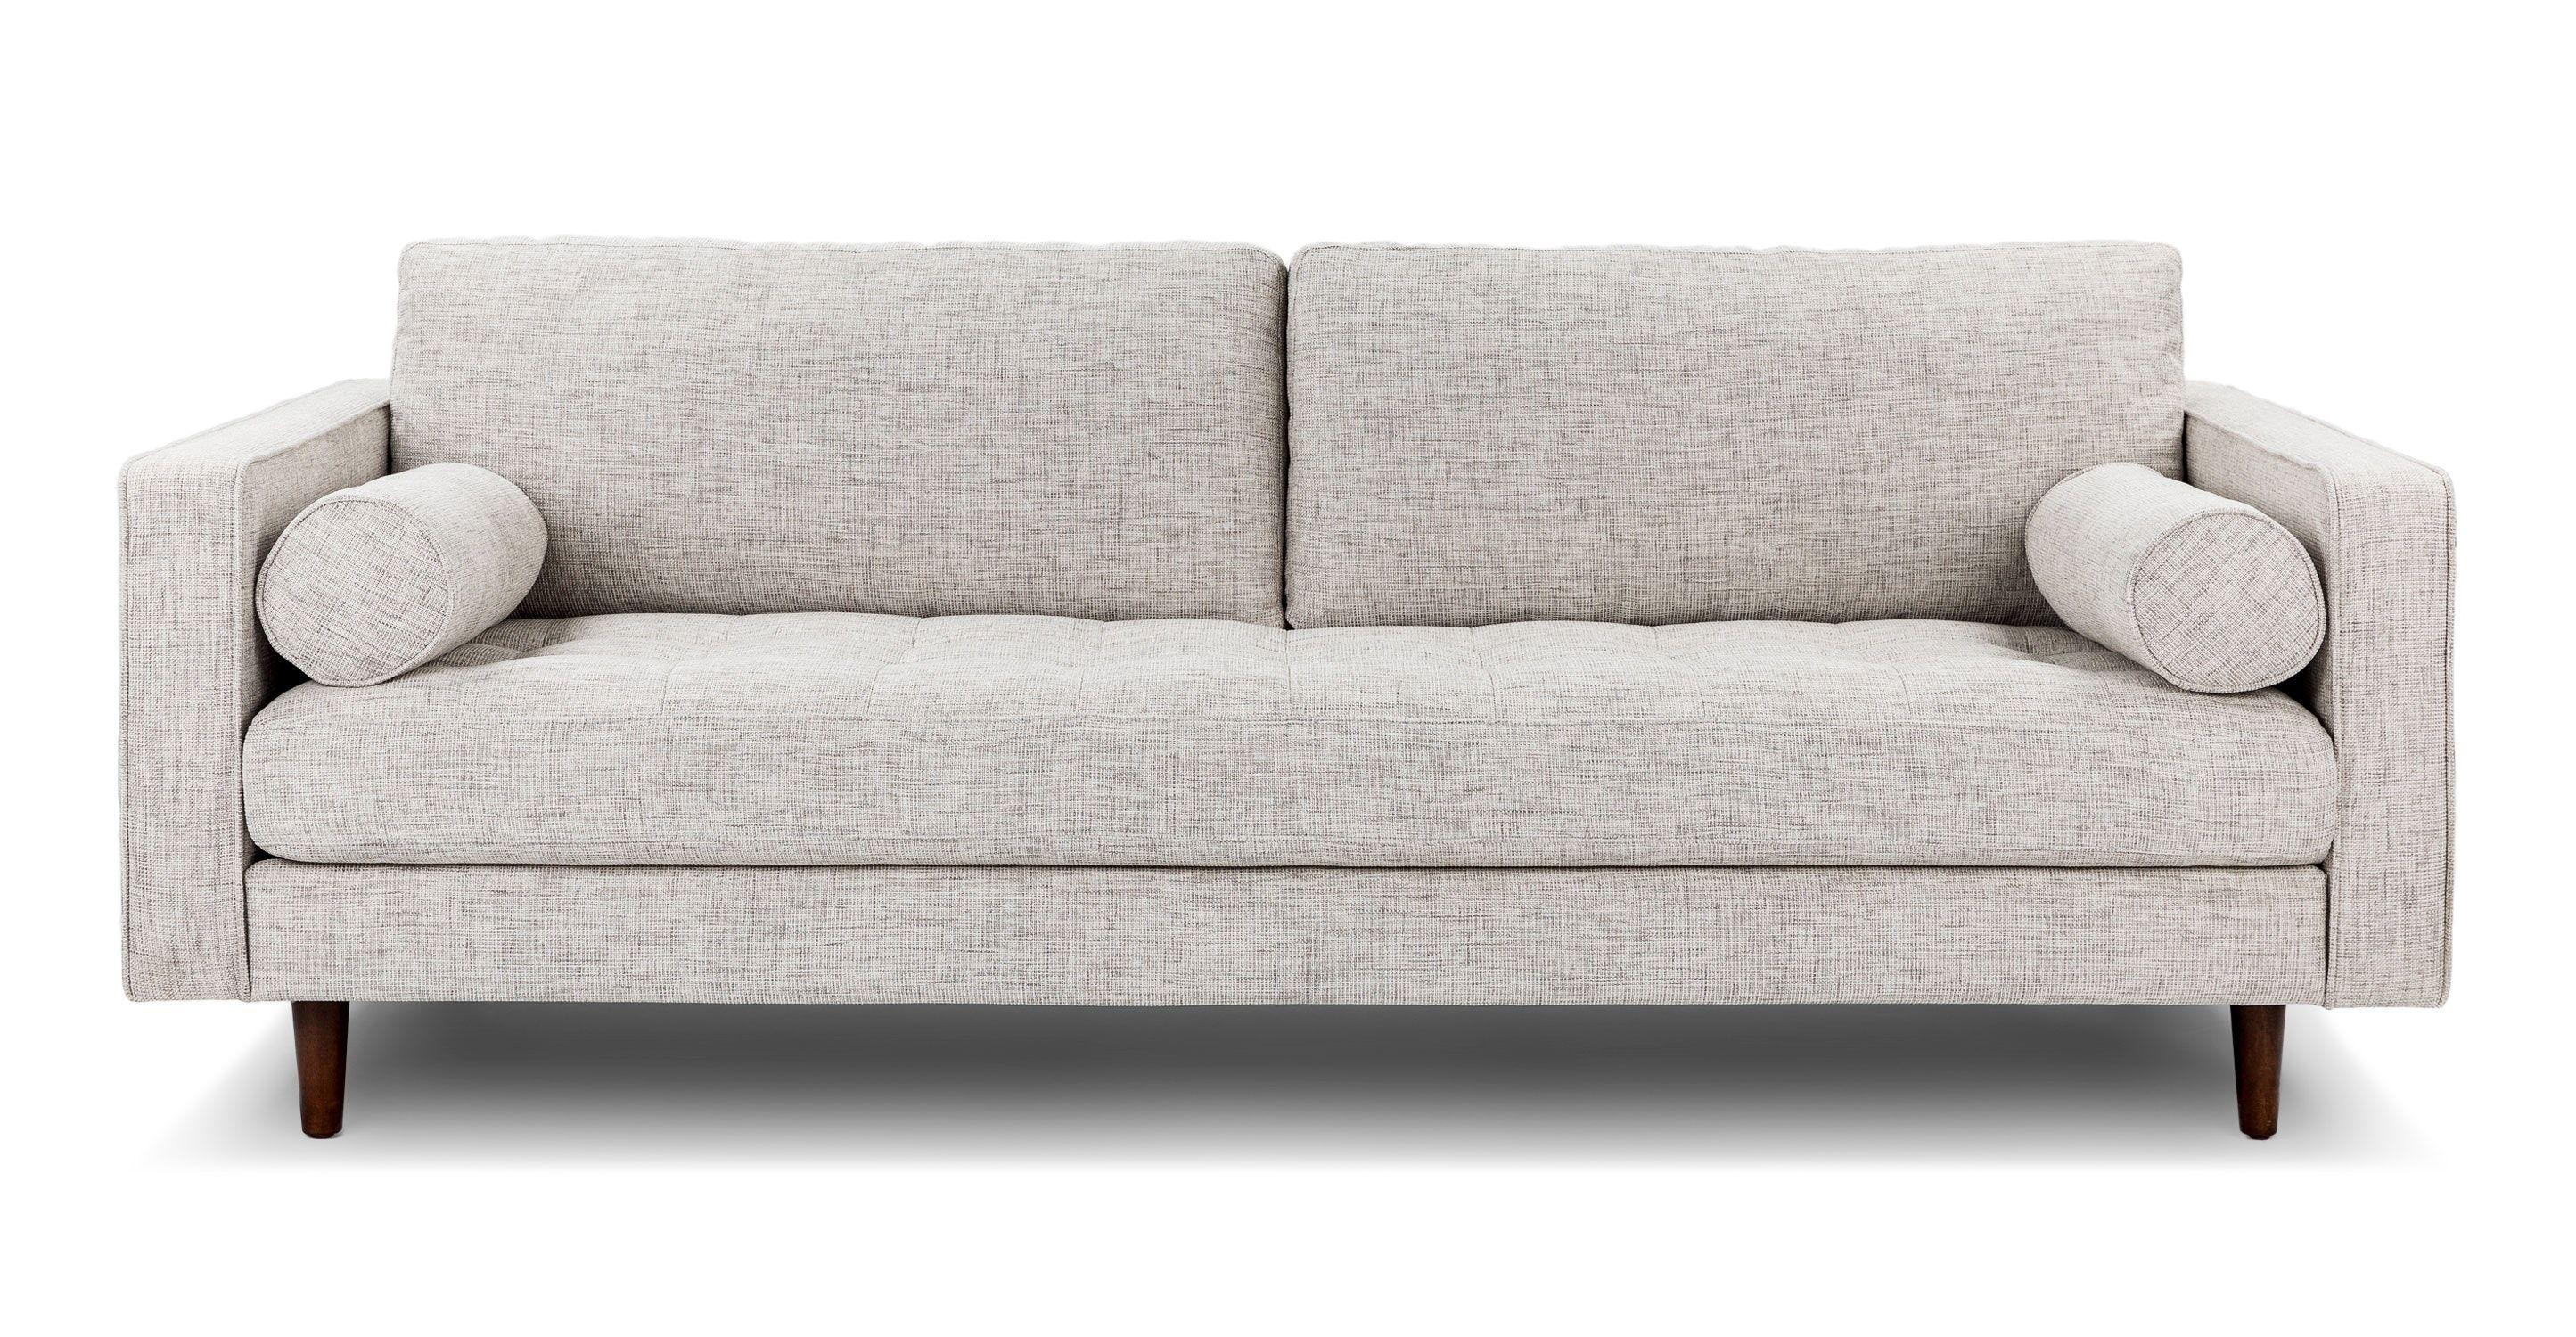 Sven Birch Ivory Sofa Sven Sofa Mid Century Modern Sofa Modern Sofa Couch